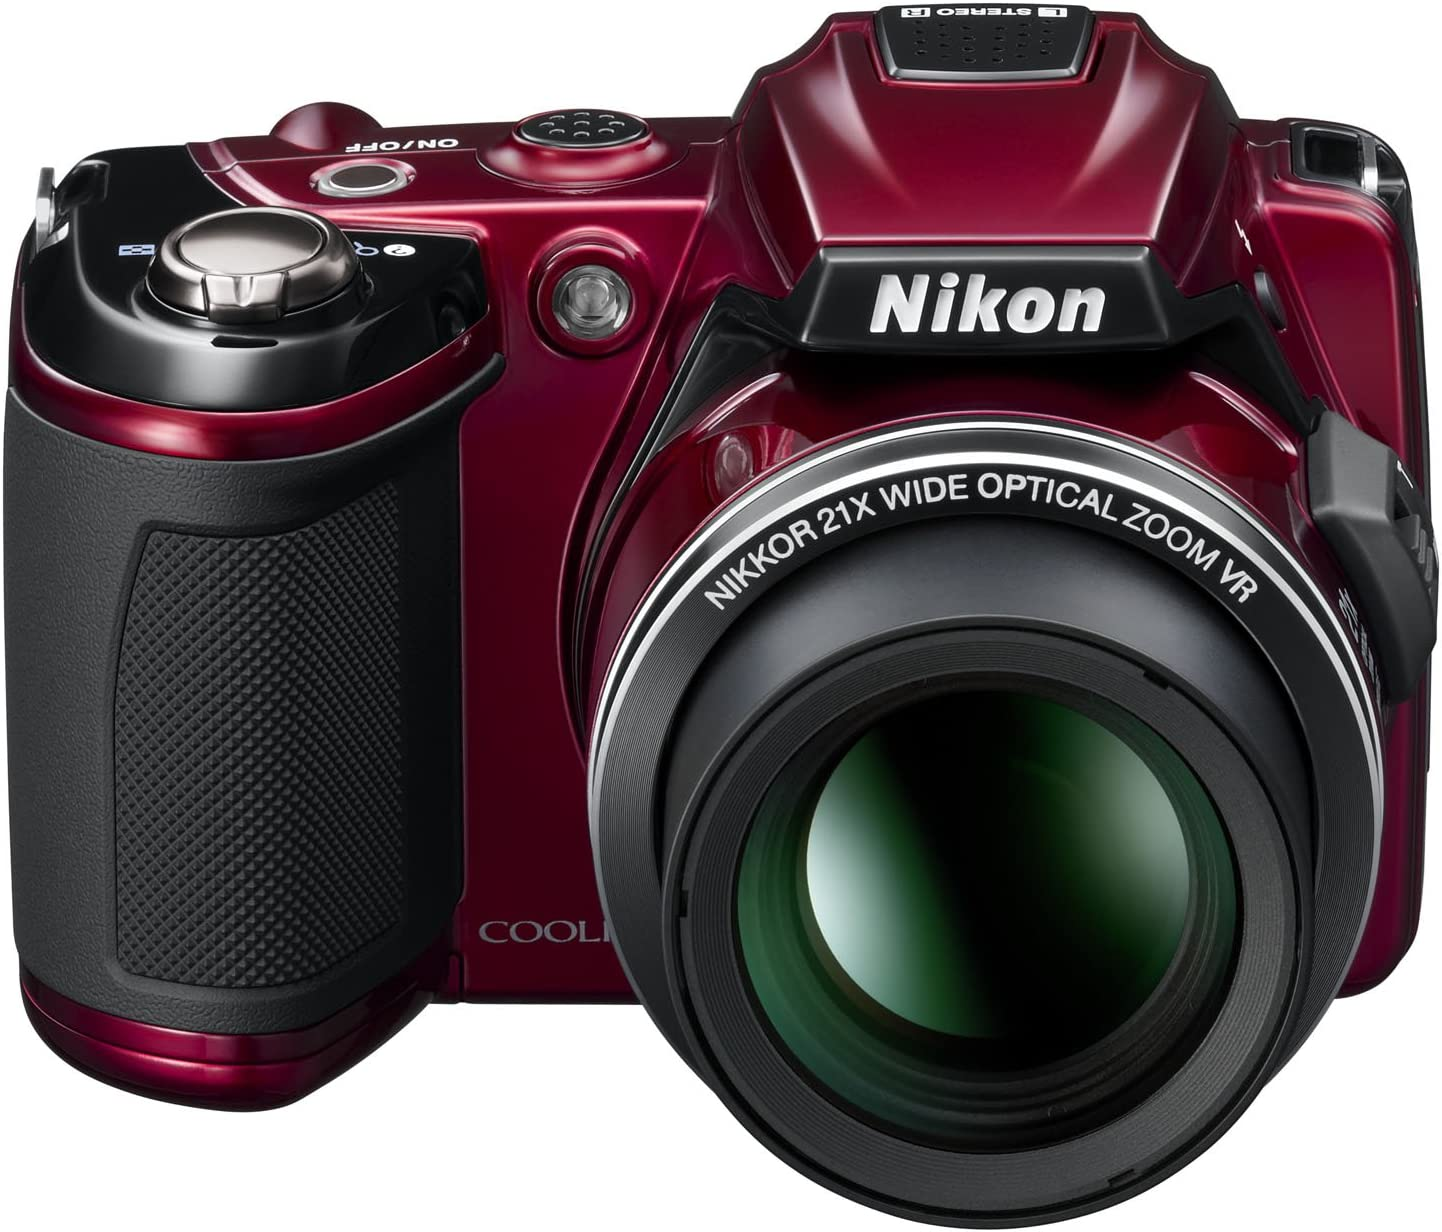 Nikon Coolpix L120 Digital Camera Red 3 Inch Lcd Camera Photo